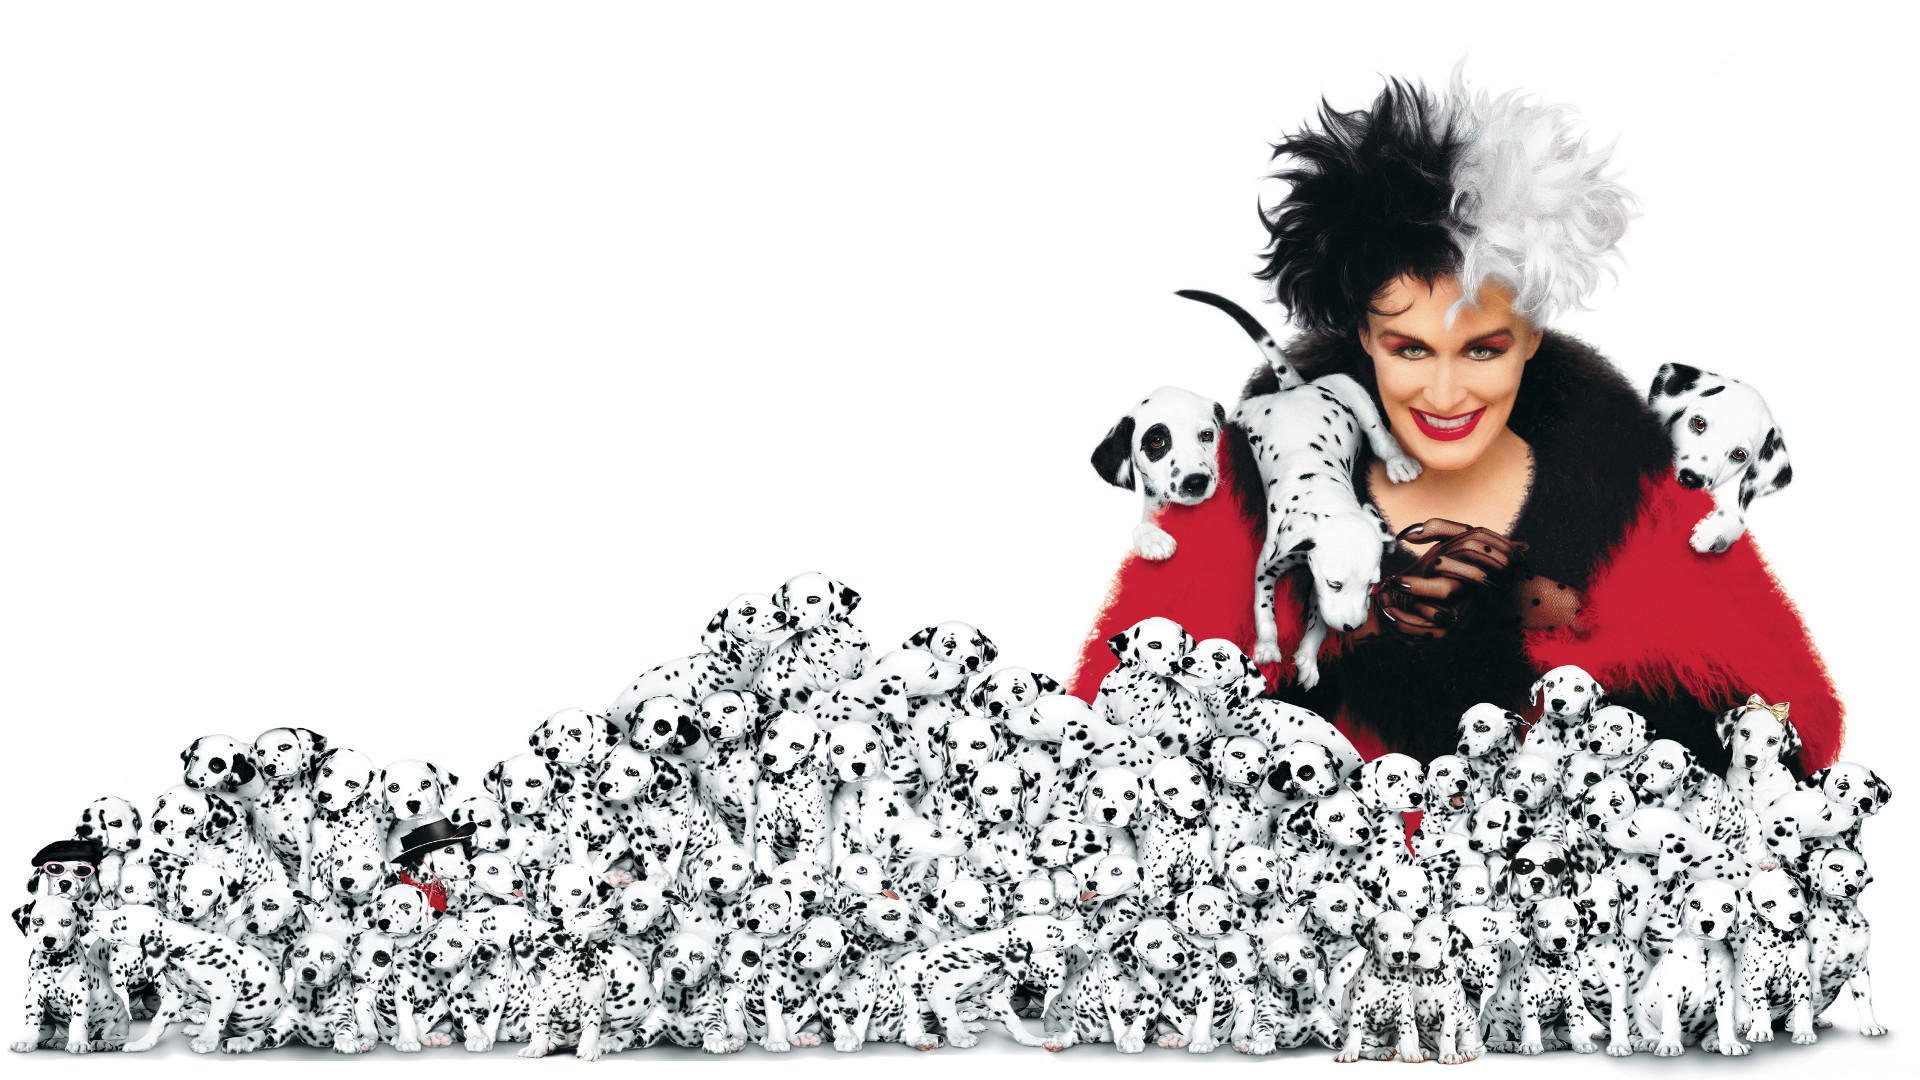 101 Dalmatians 1996 Movie Filmnod Com